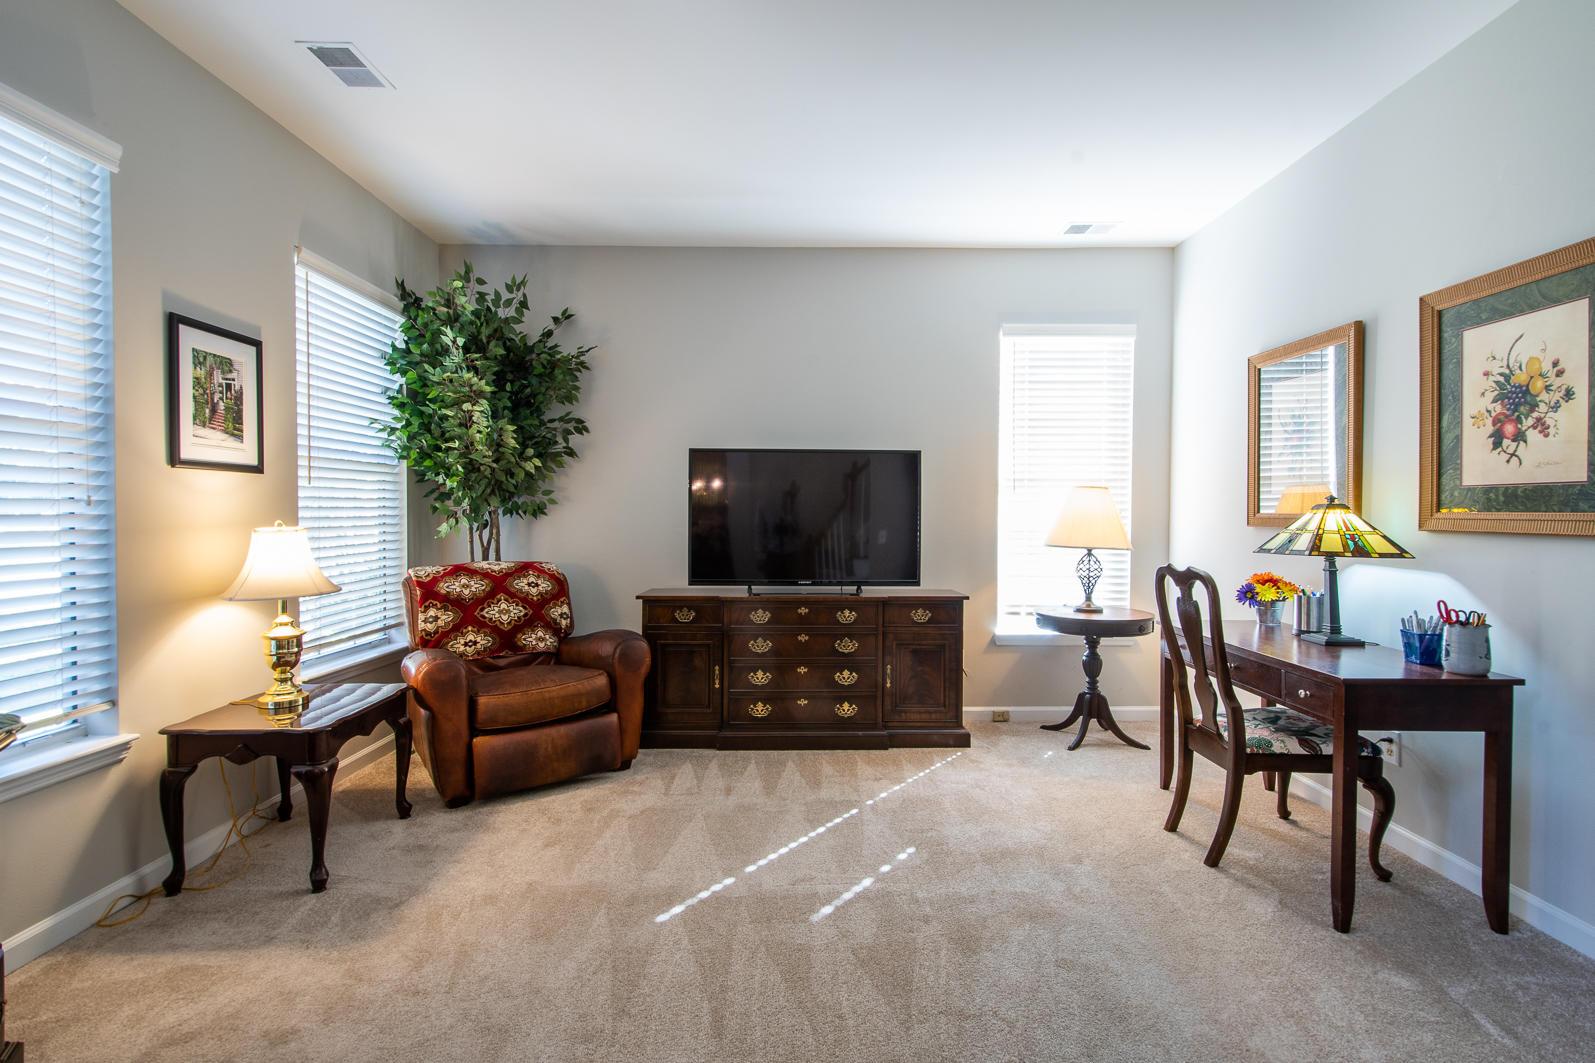 Belle Hall Homes For Sale - 407 Jardinere, Mount Pleasant, SC - 28